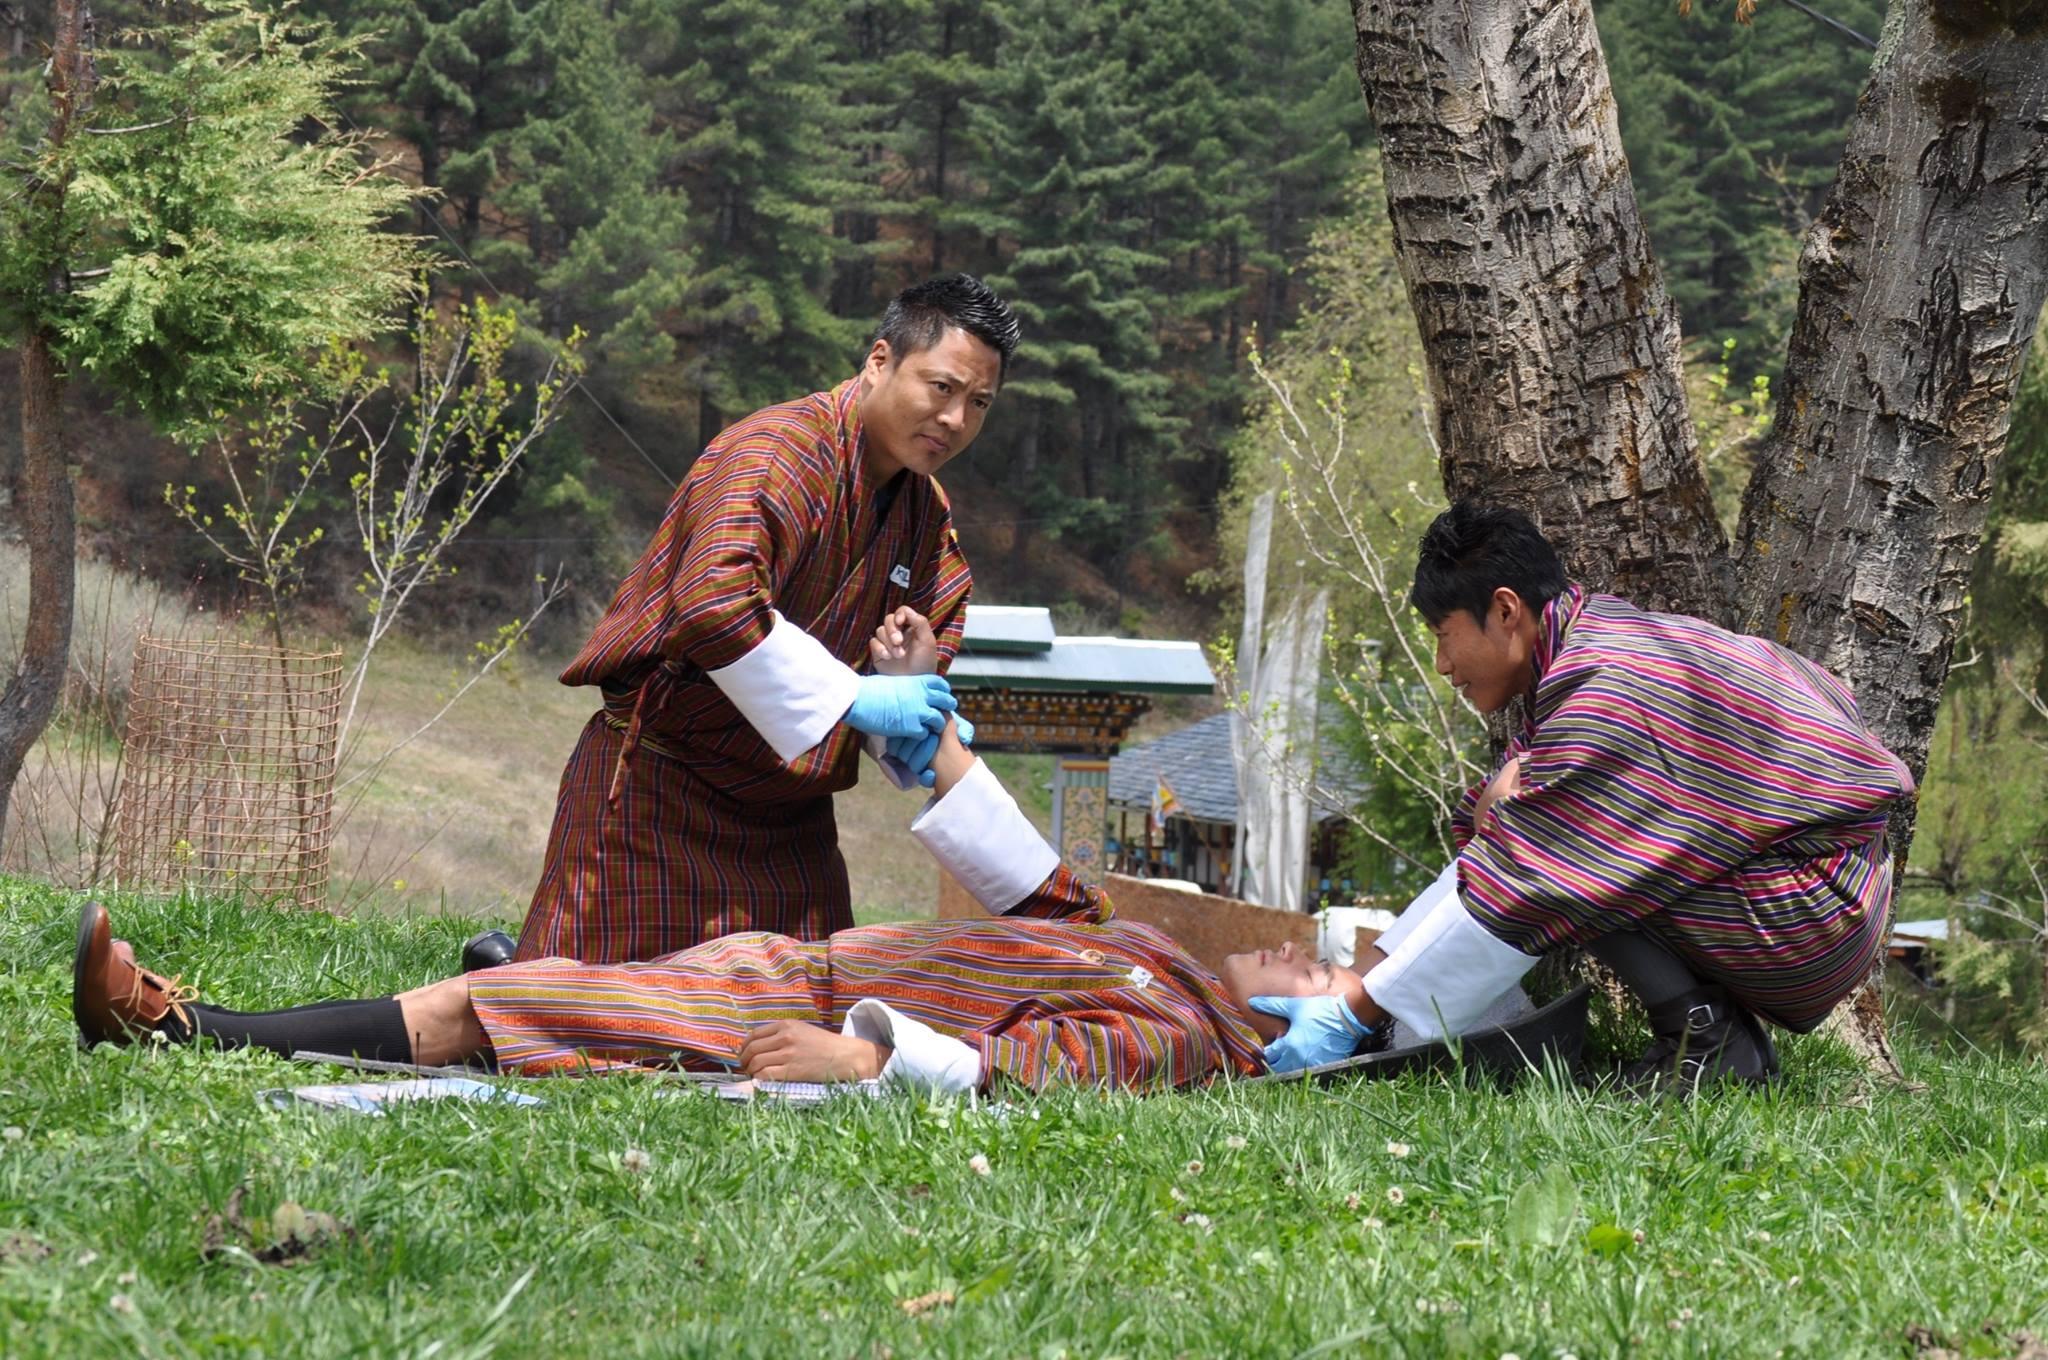 Business - Health & Fitness | NOLS Wilderness Emergency Medicine Technician (WEMT)